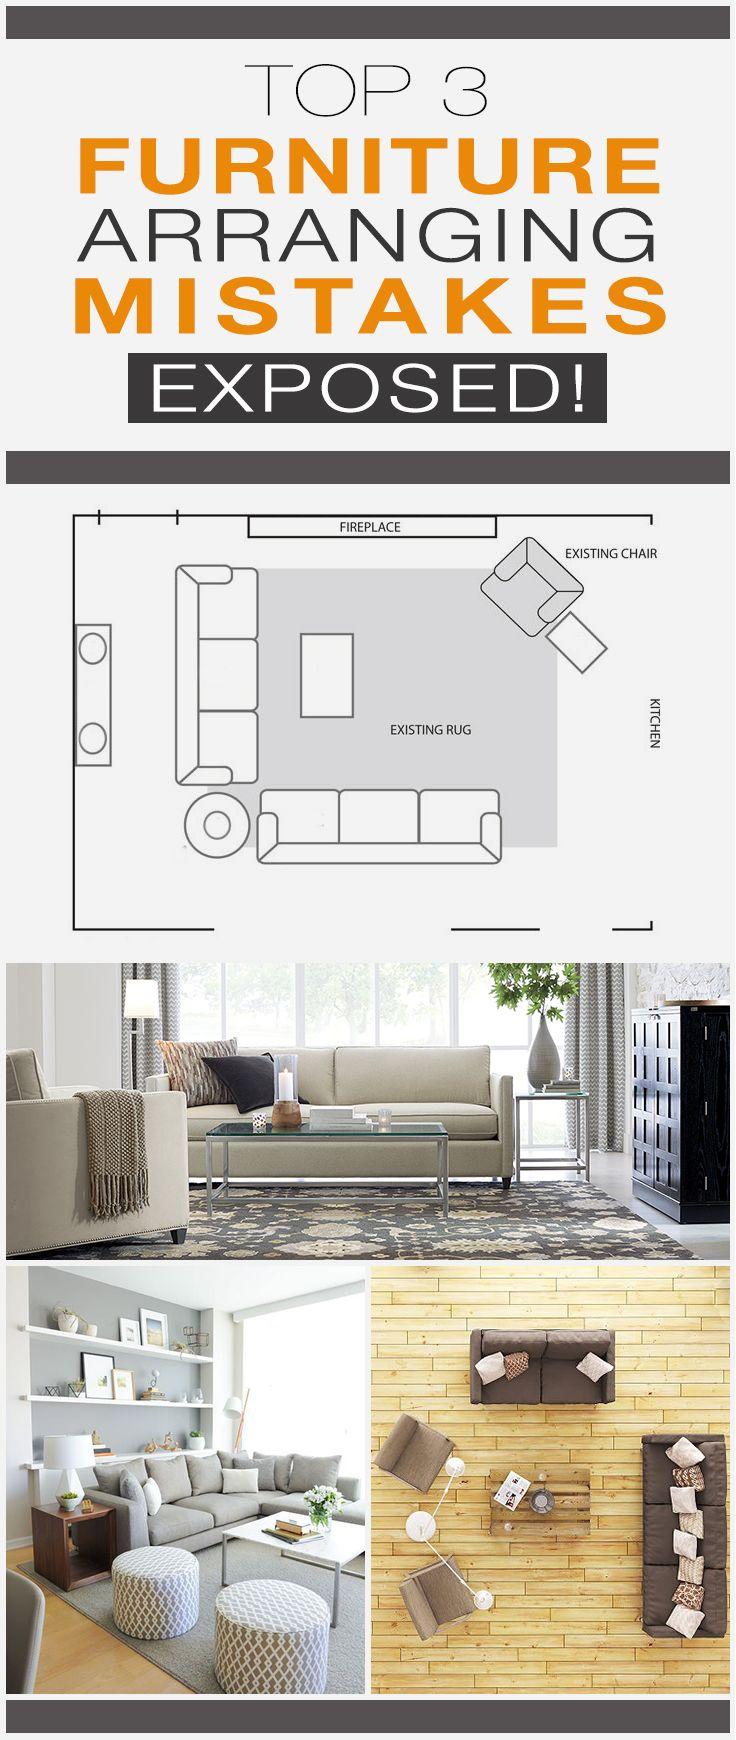 Best 25+ Arrange furniture ideas on Pinterest | Furniture ...